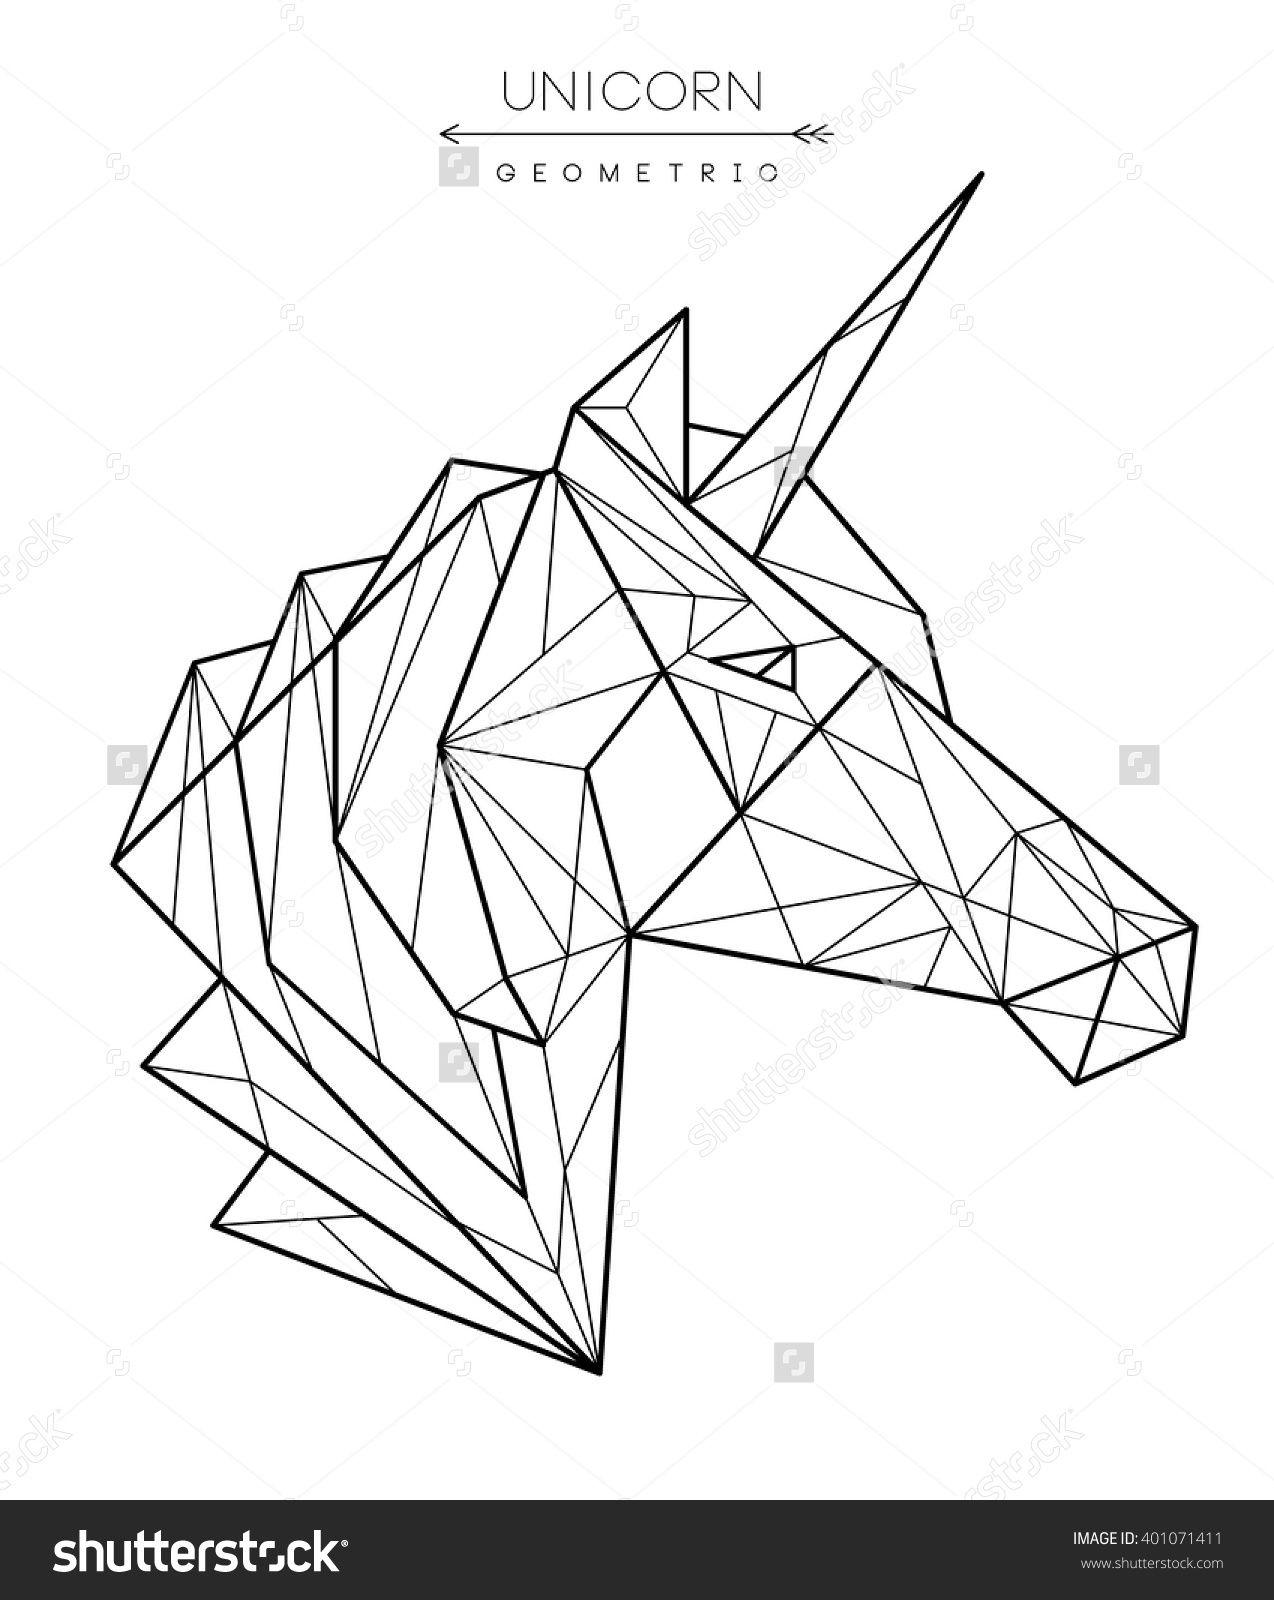 Risultati Immagini Per Geometric Unicorn